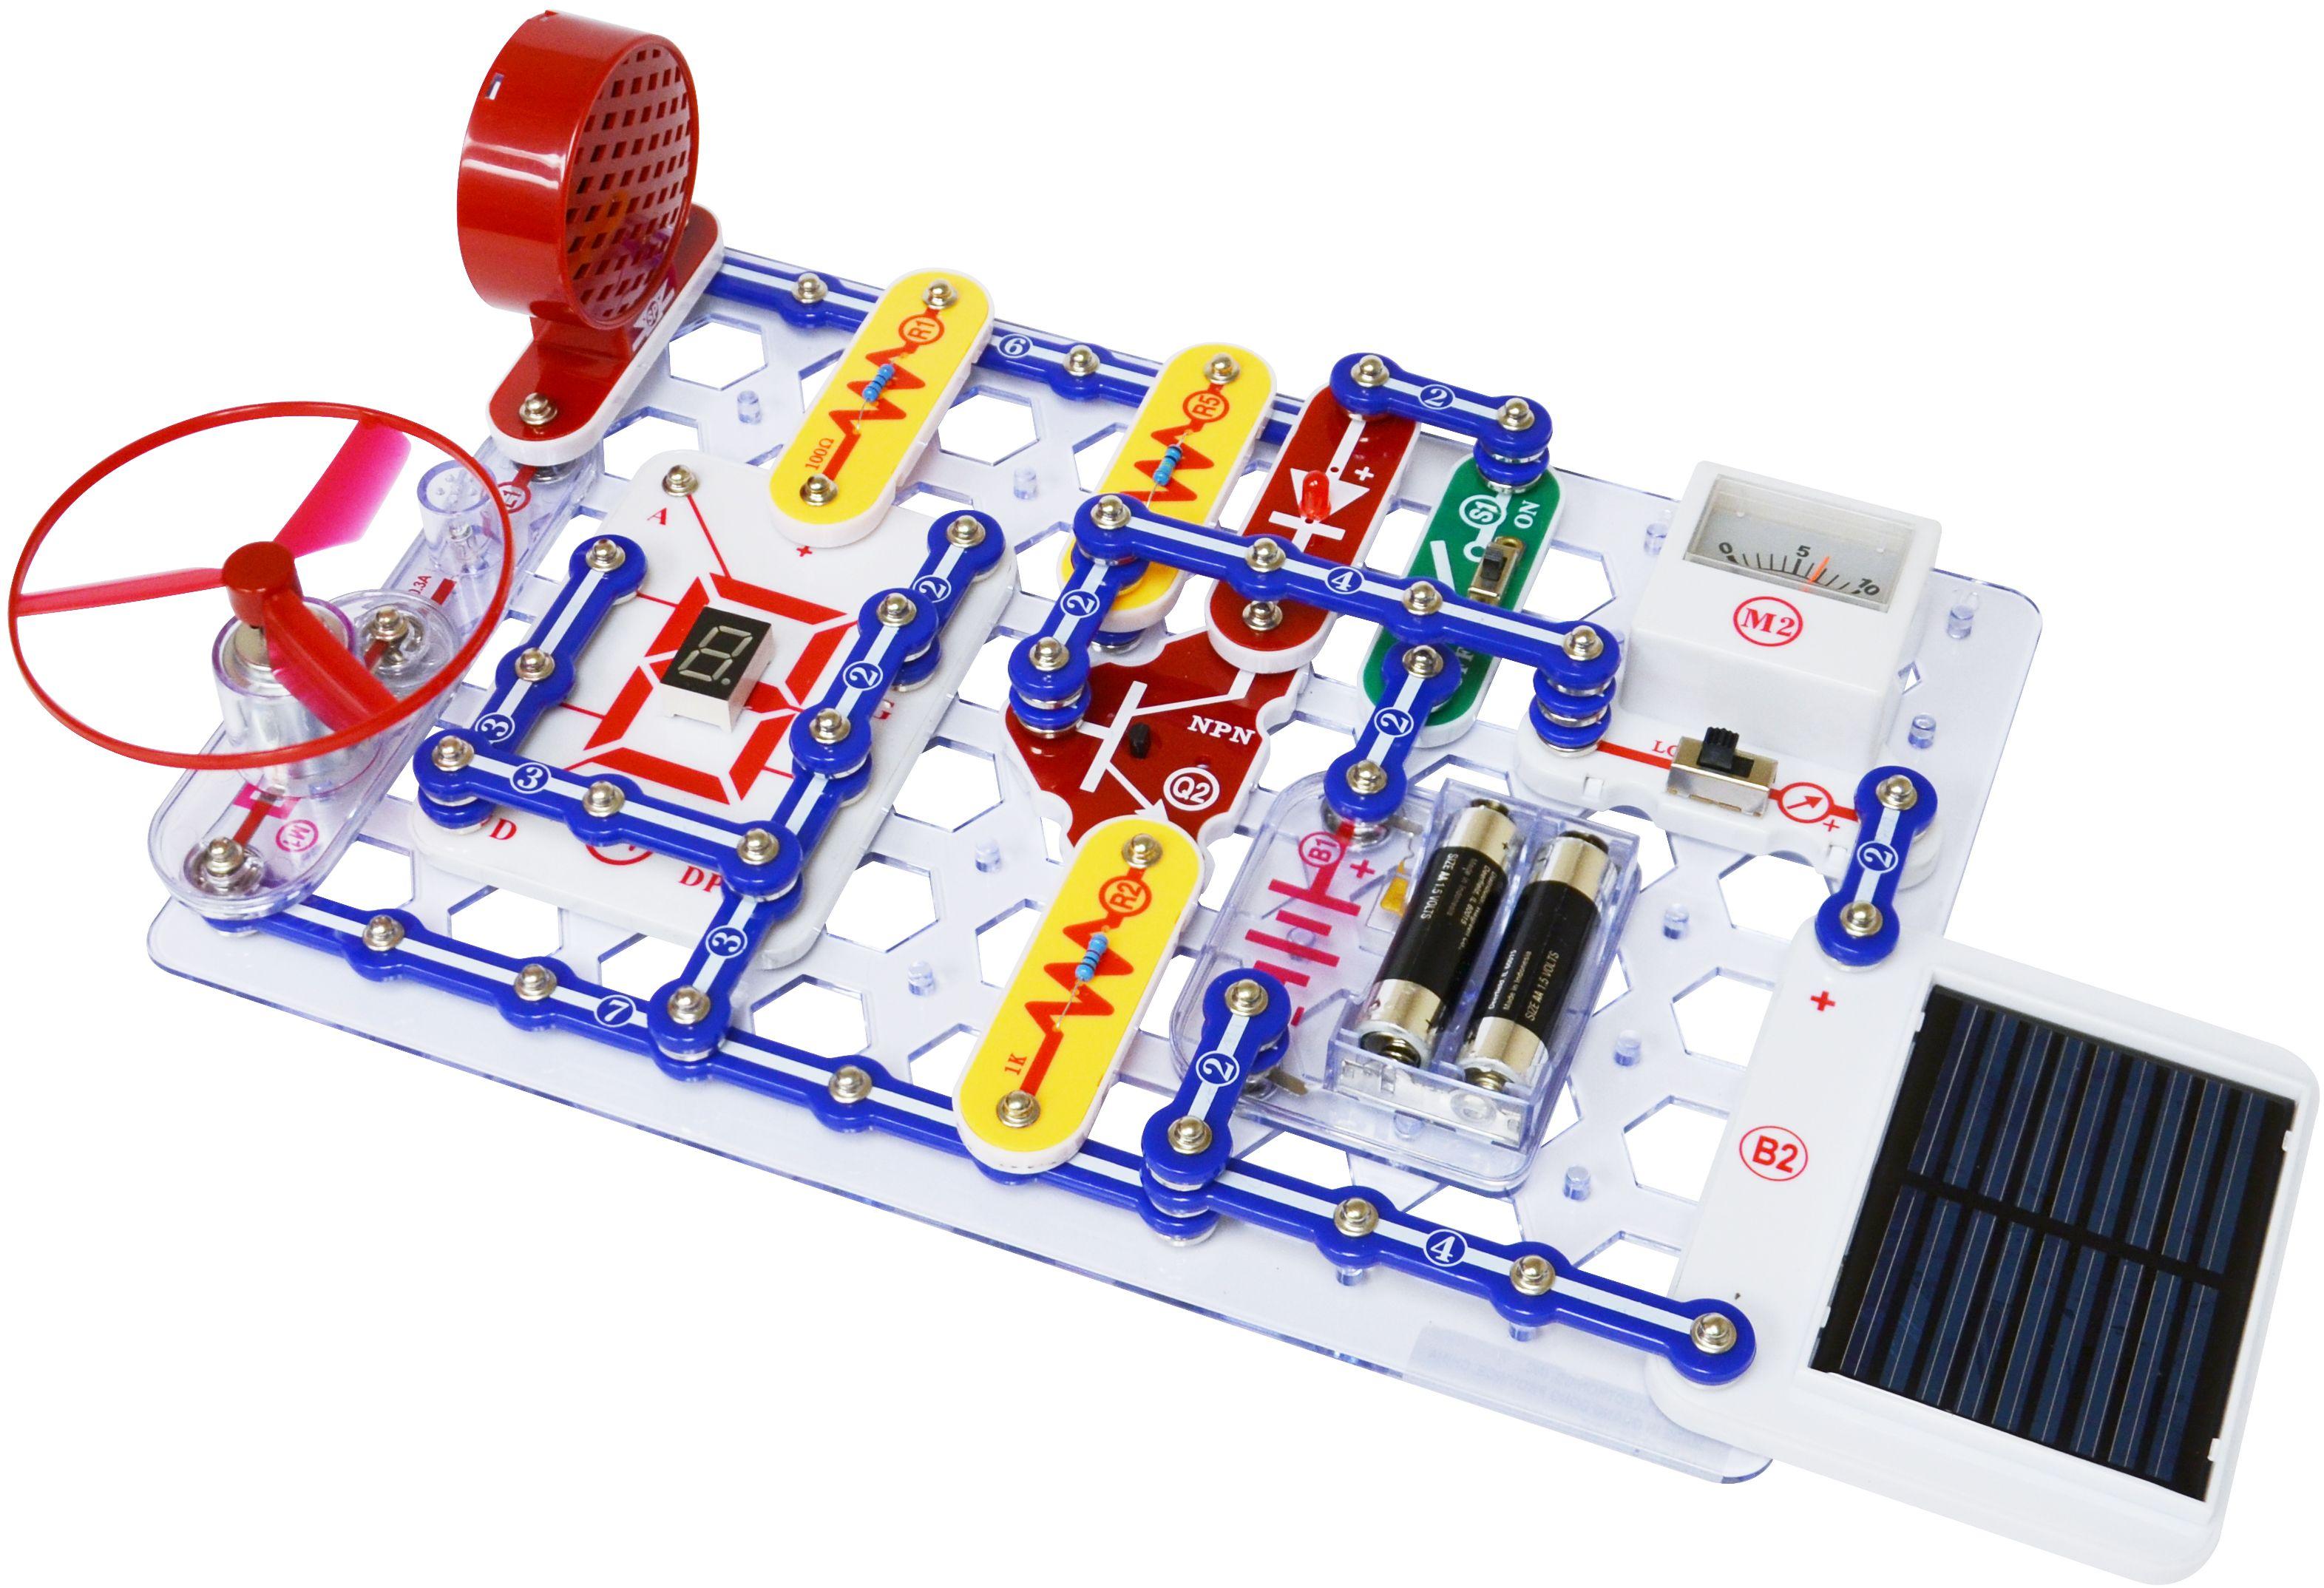 Model Sc 750 Snap Circuits Extreme Experiments Snapcircuits Fm Radio Kit Ebay